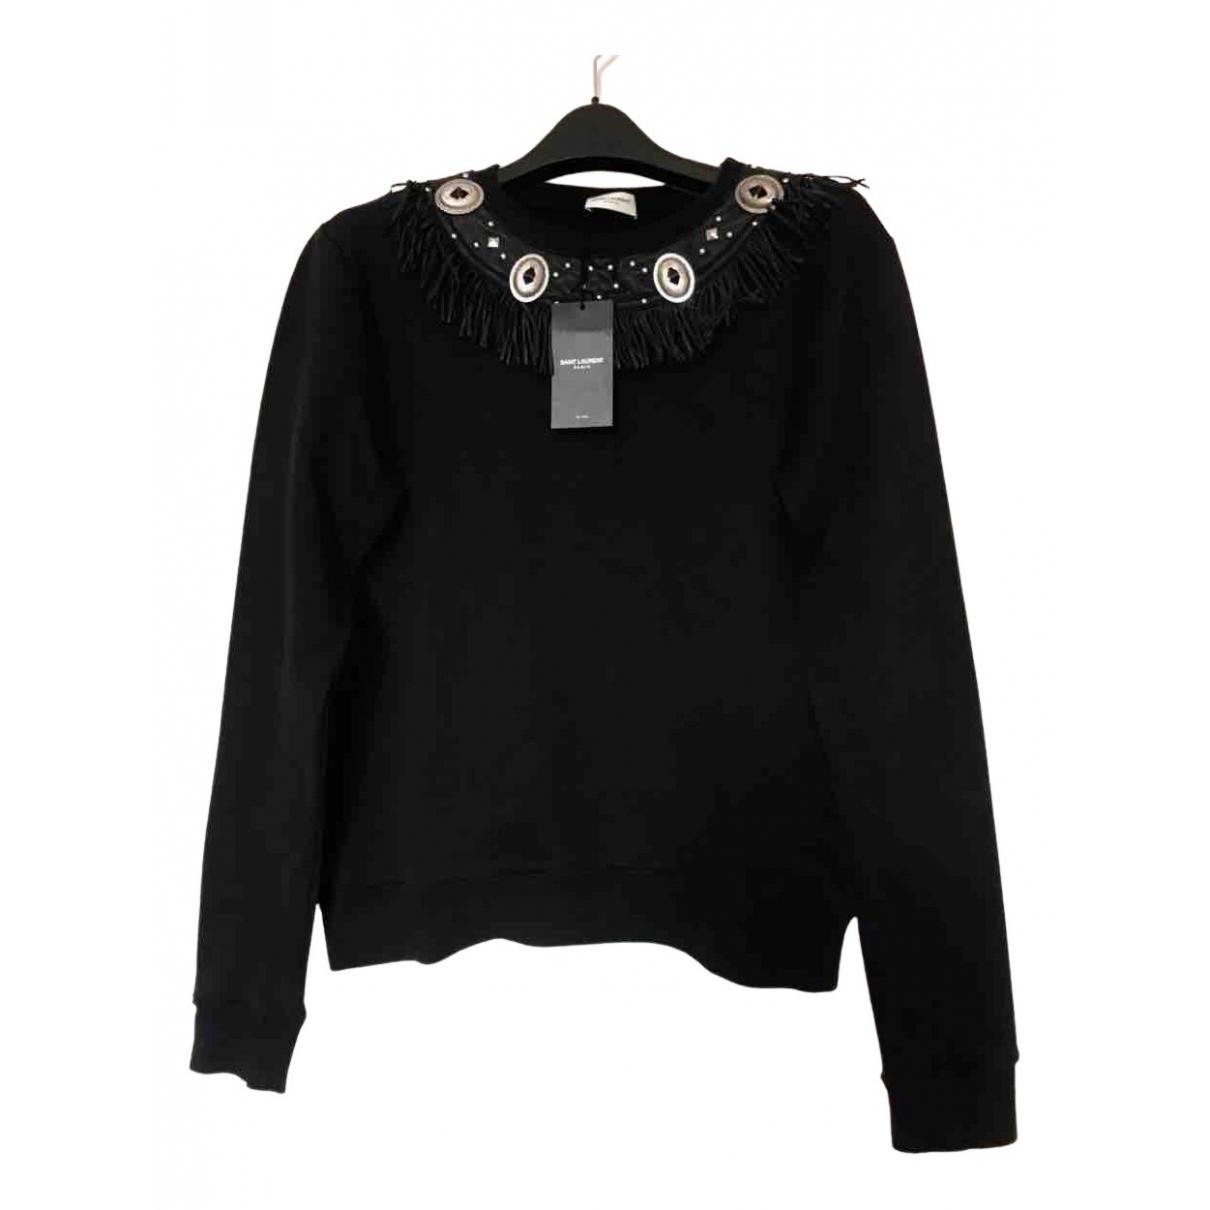 Saint Laurent N Black Cotton Knitwear & Sweatshirts for Men L International